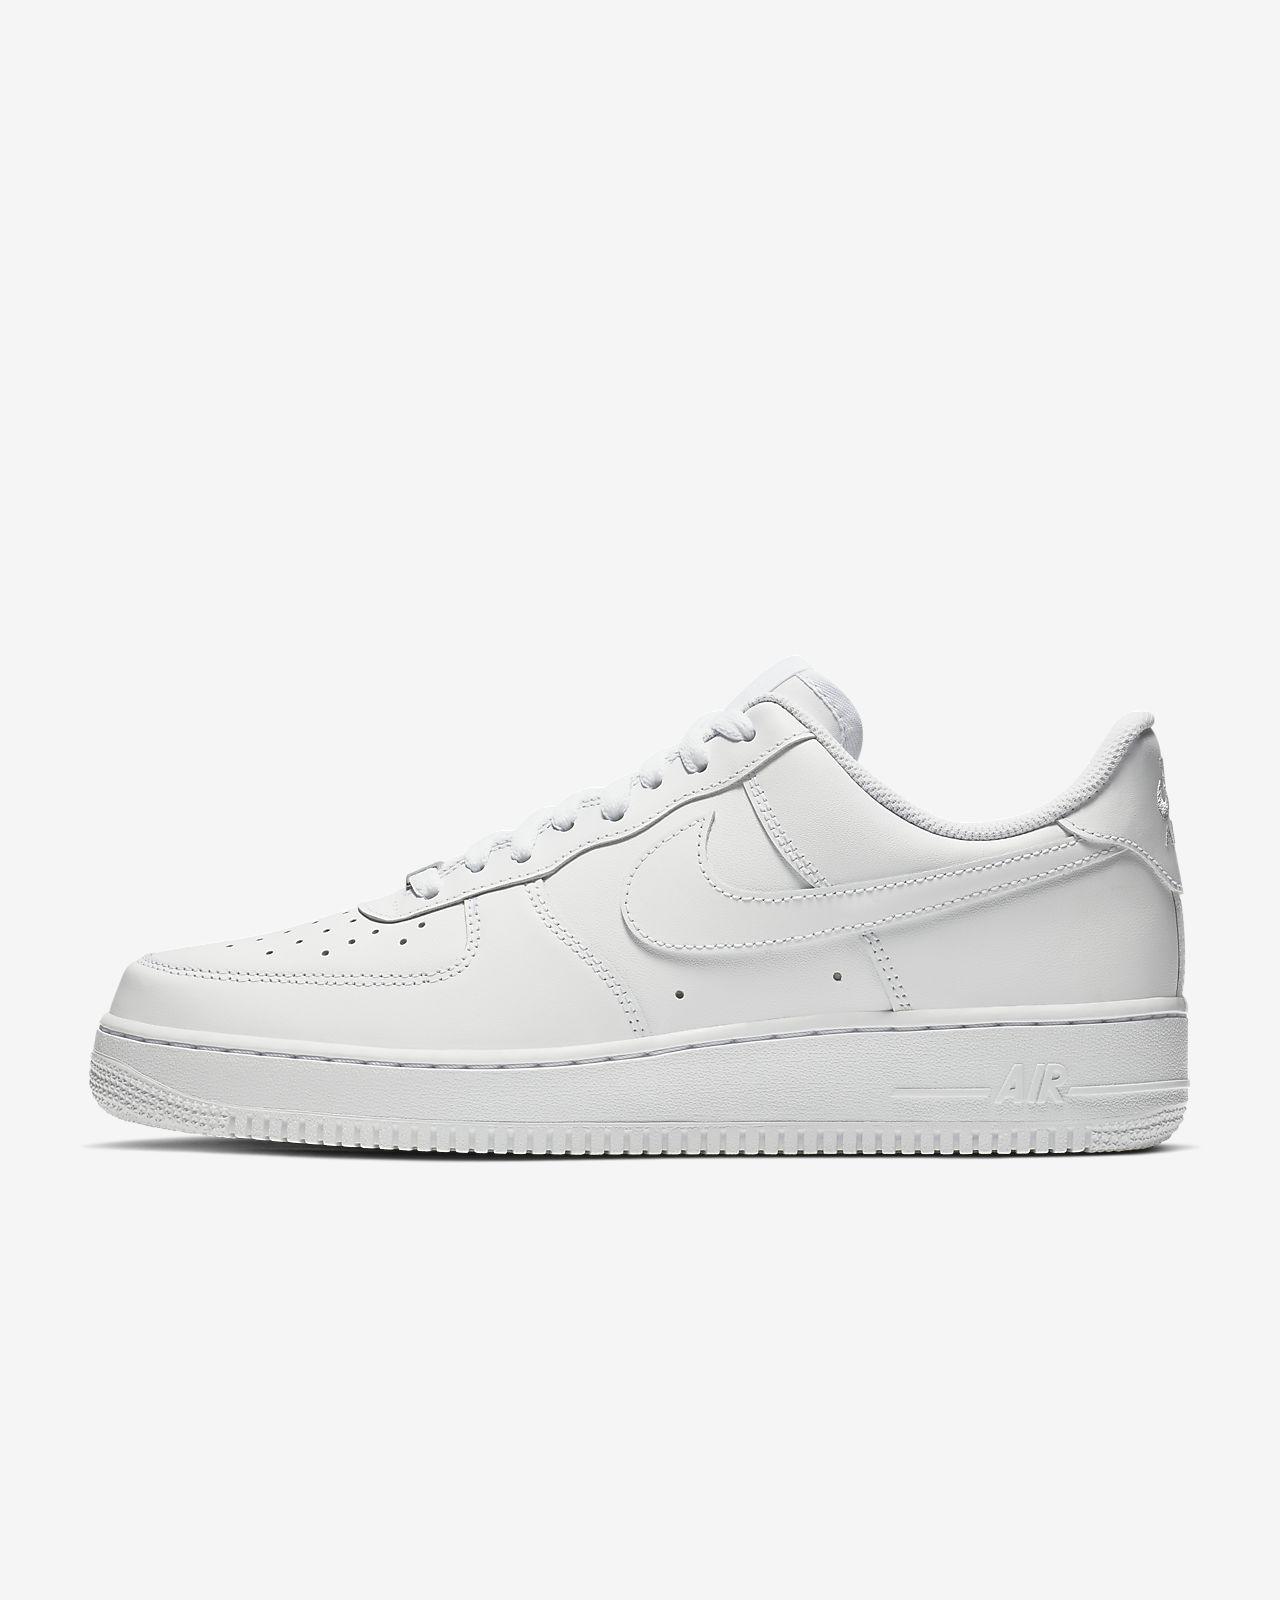 9da6f99e5712 Мужские кроссовки Nike Air Force 1  07. Nike.com RU